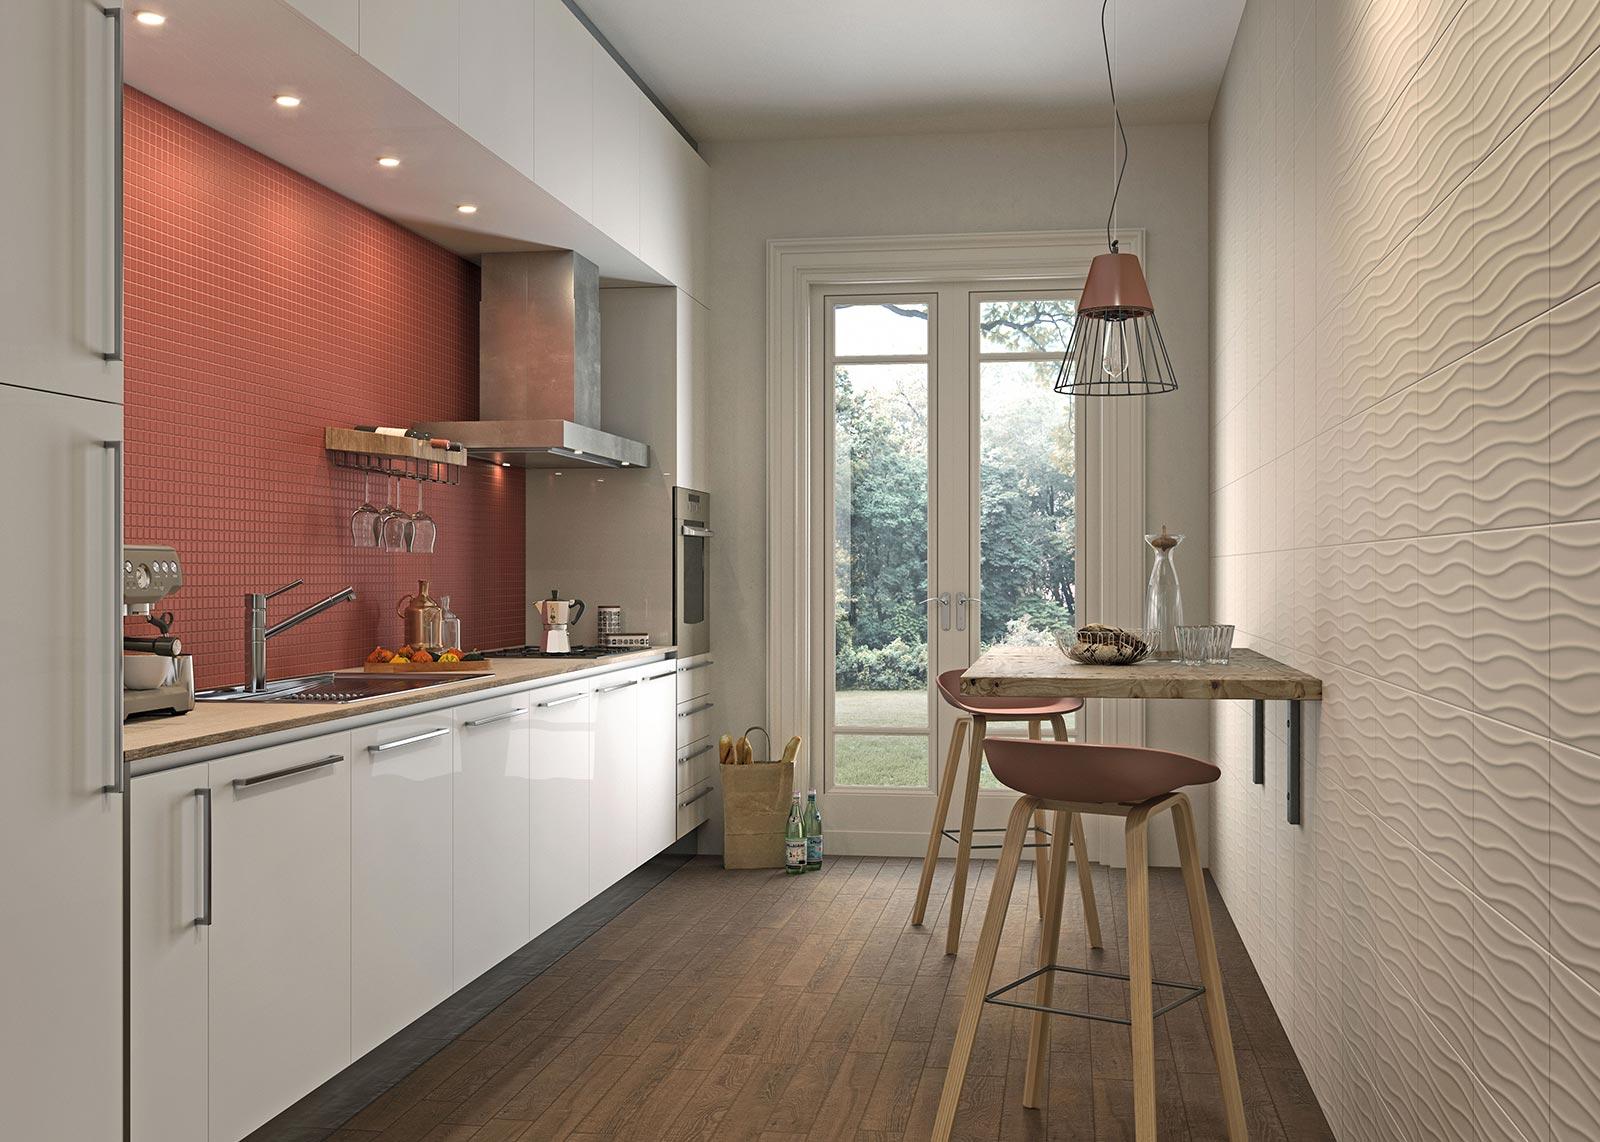 Cubrir Azulejos Cocina Dise Os Arquitect Nicos Mimasku Com ~ Paneles Para Cubrir Azulejos Cocina